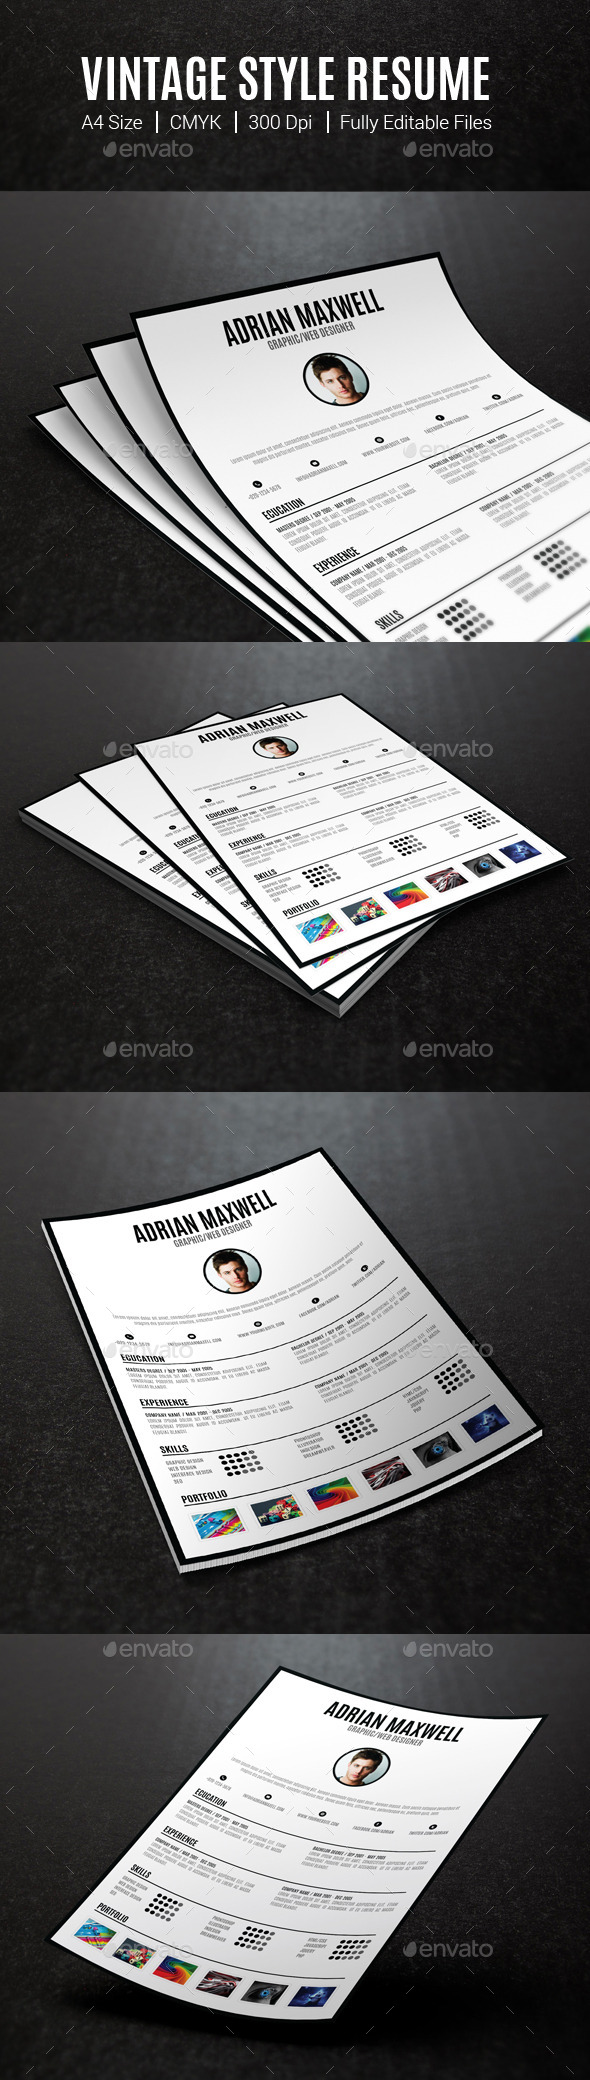 GraphicRiver Vintage Style Resume 10498393